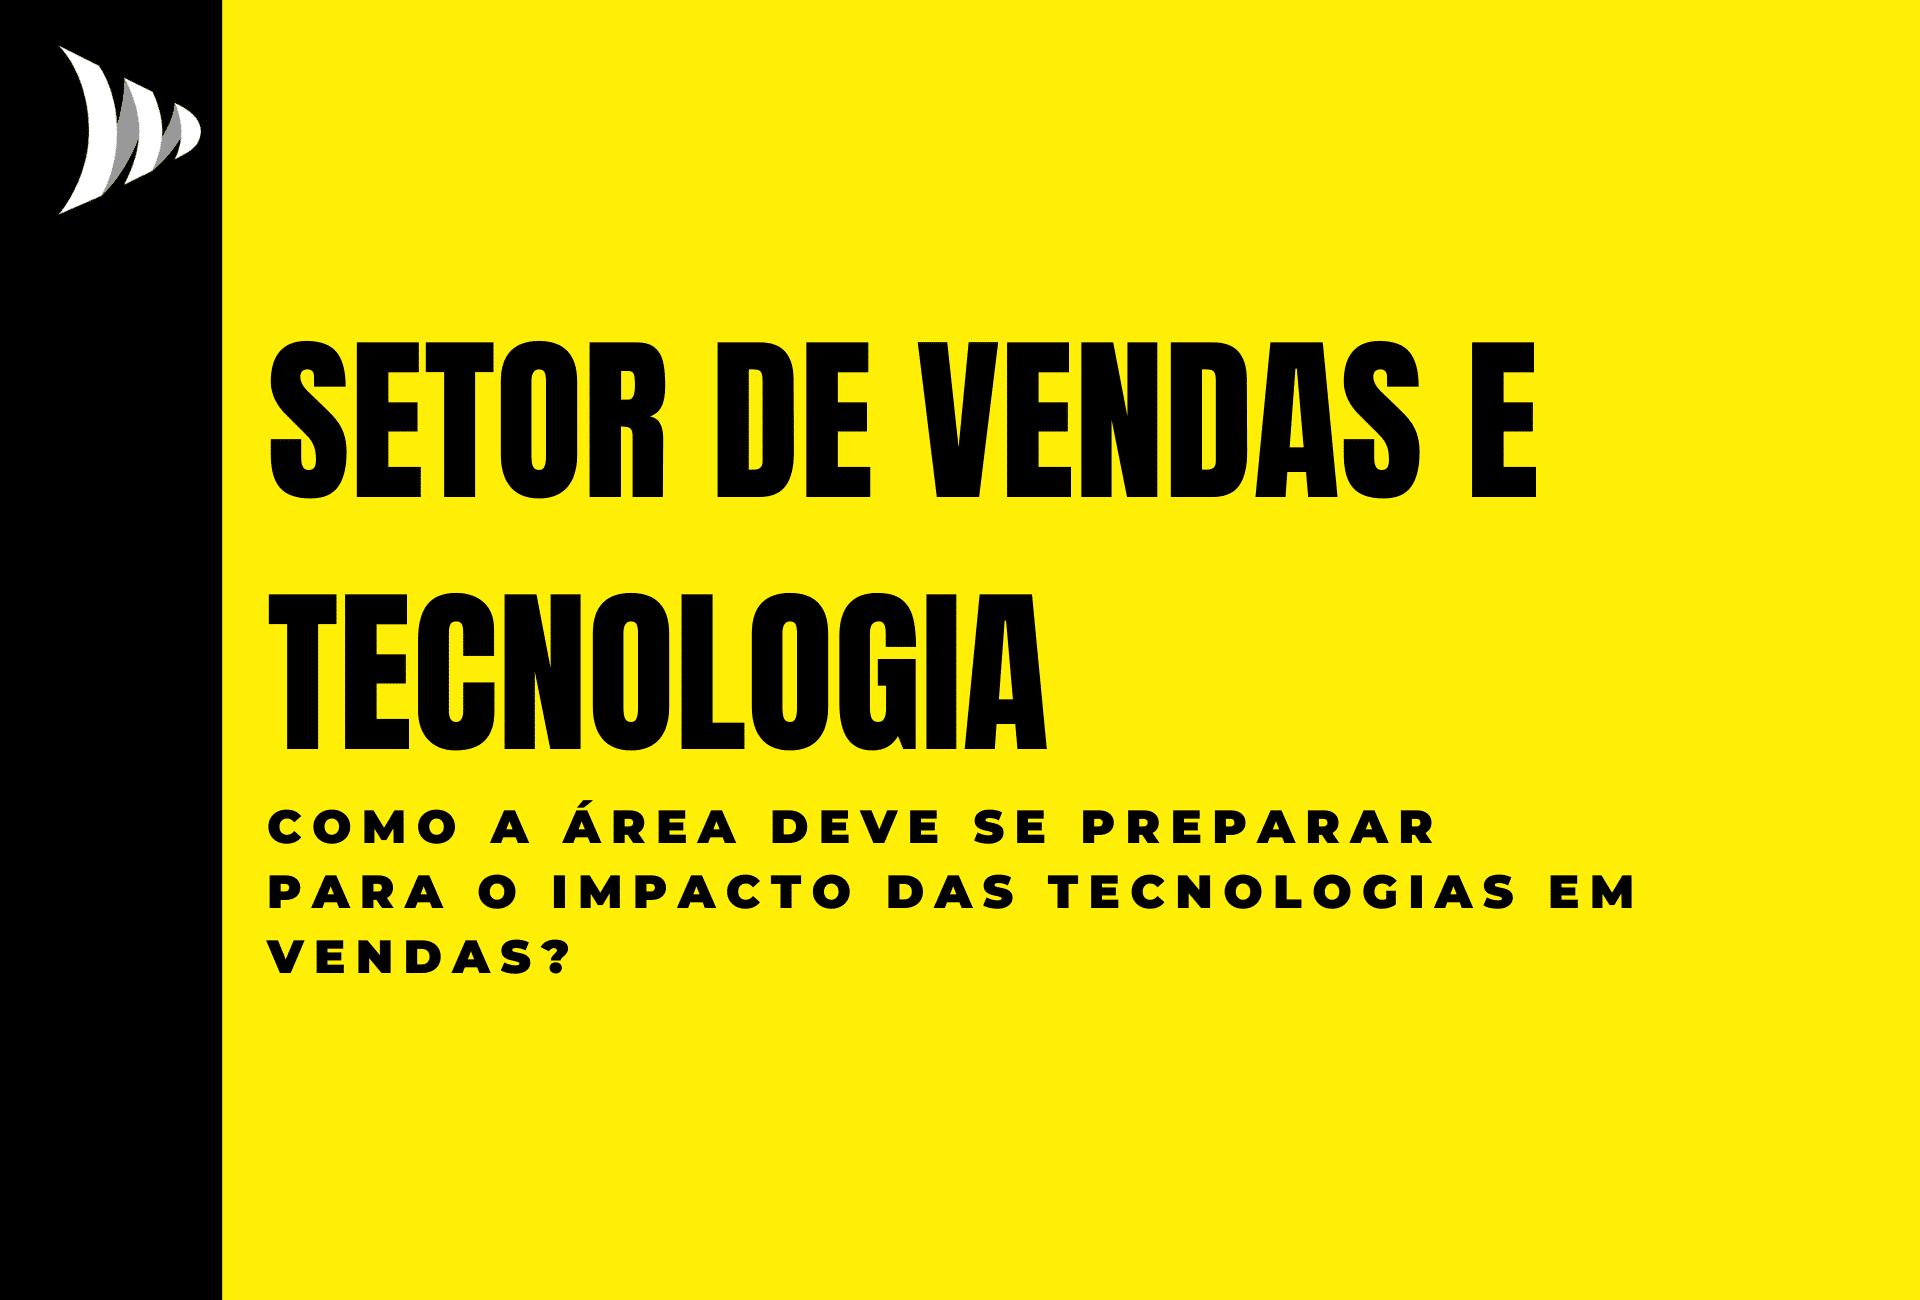 O setor de vendas e a tecnologia